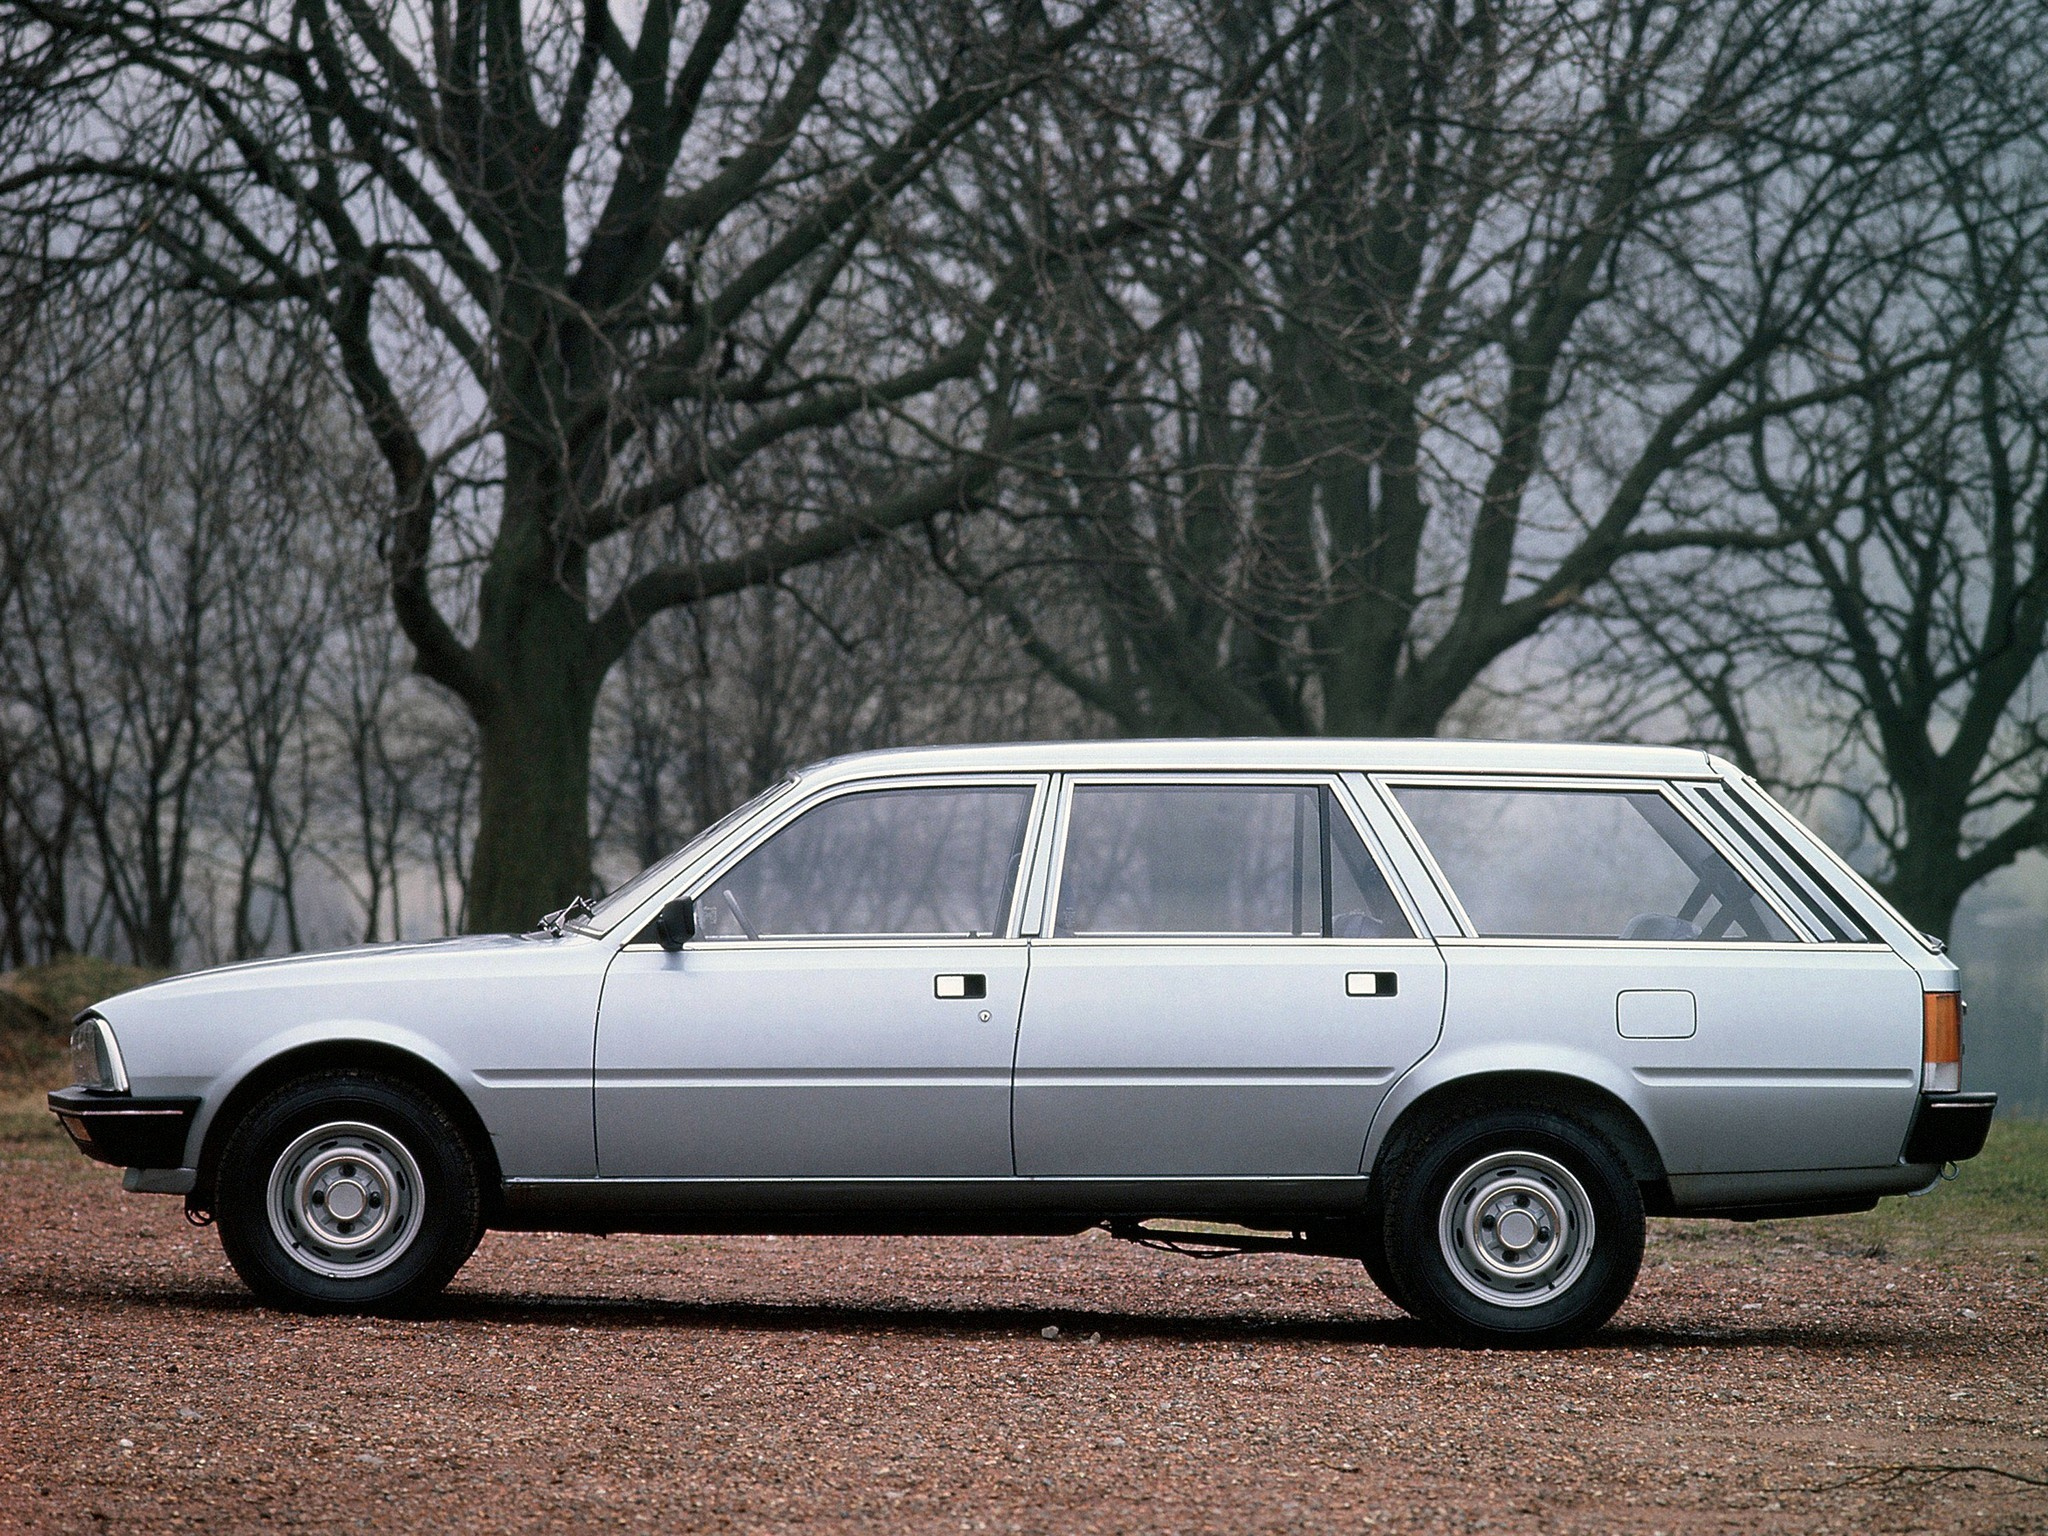 Peugeot 505 Break Specs Photos 1985 1986 1987 1988 1989 1990 1991 1992 Autoevolution